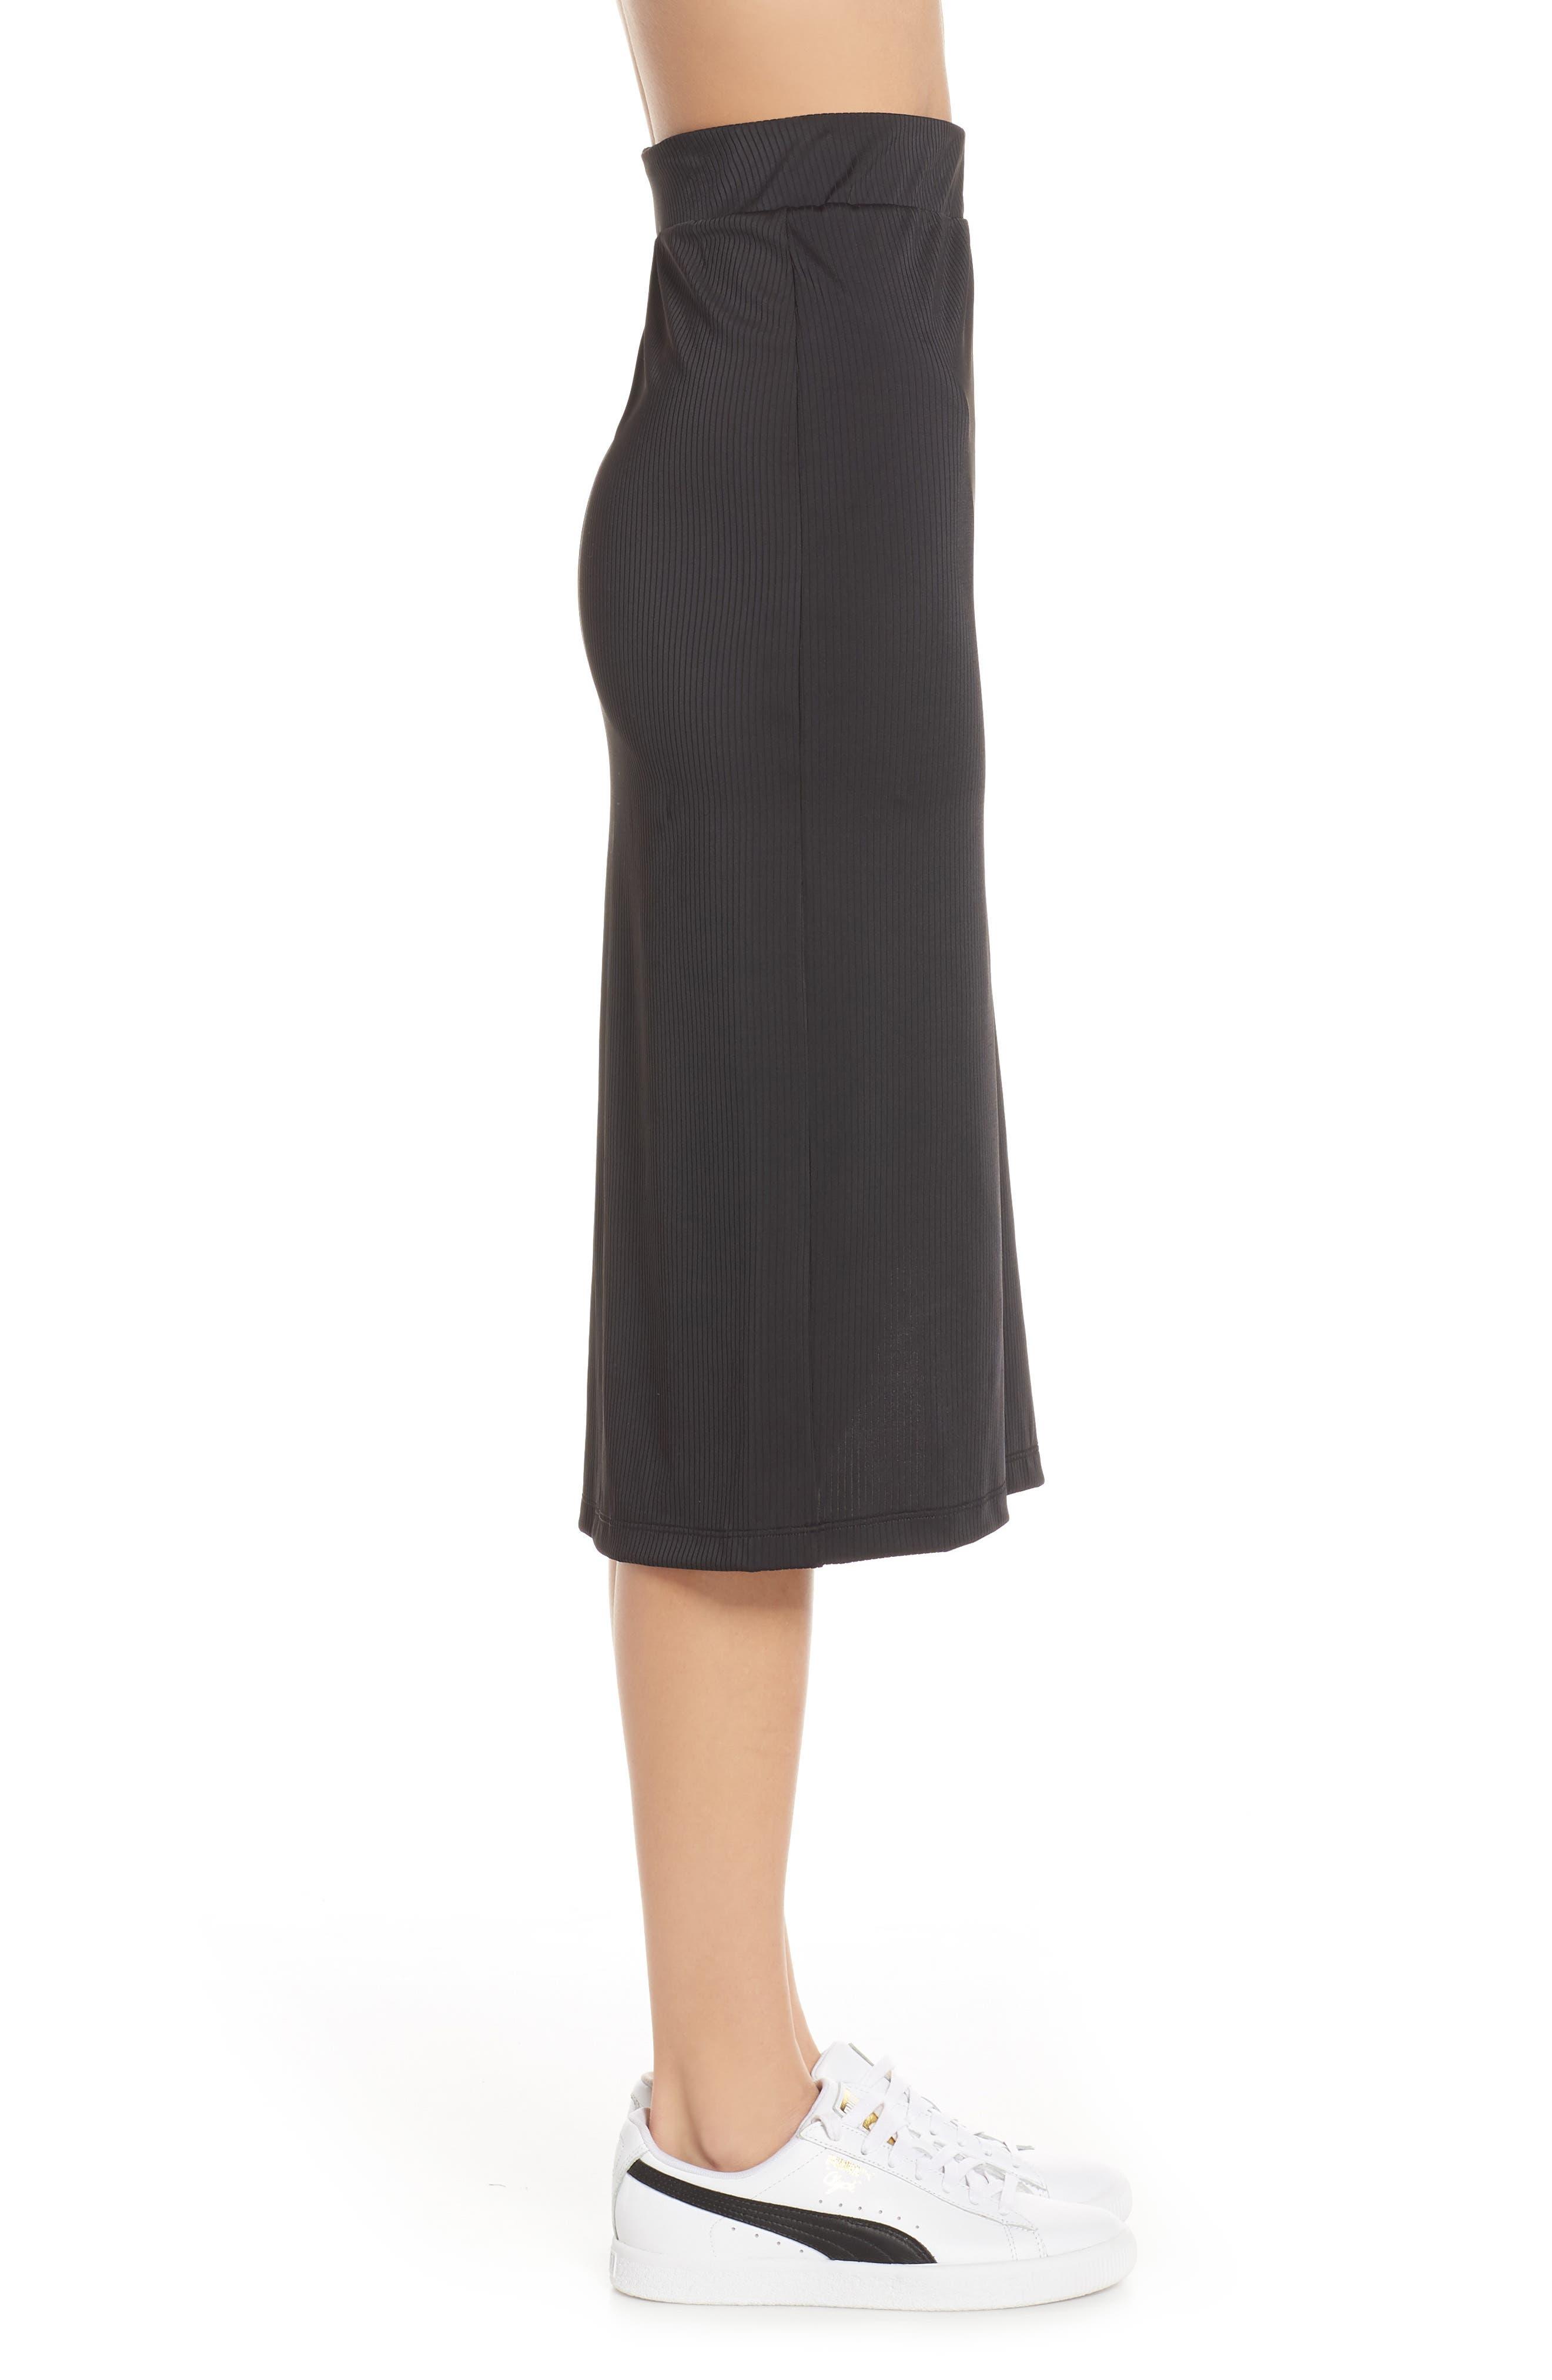 PUMA, Classics Ribbed Skirt, Alternate thumbnail 4, color, 001